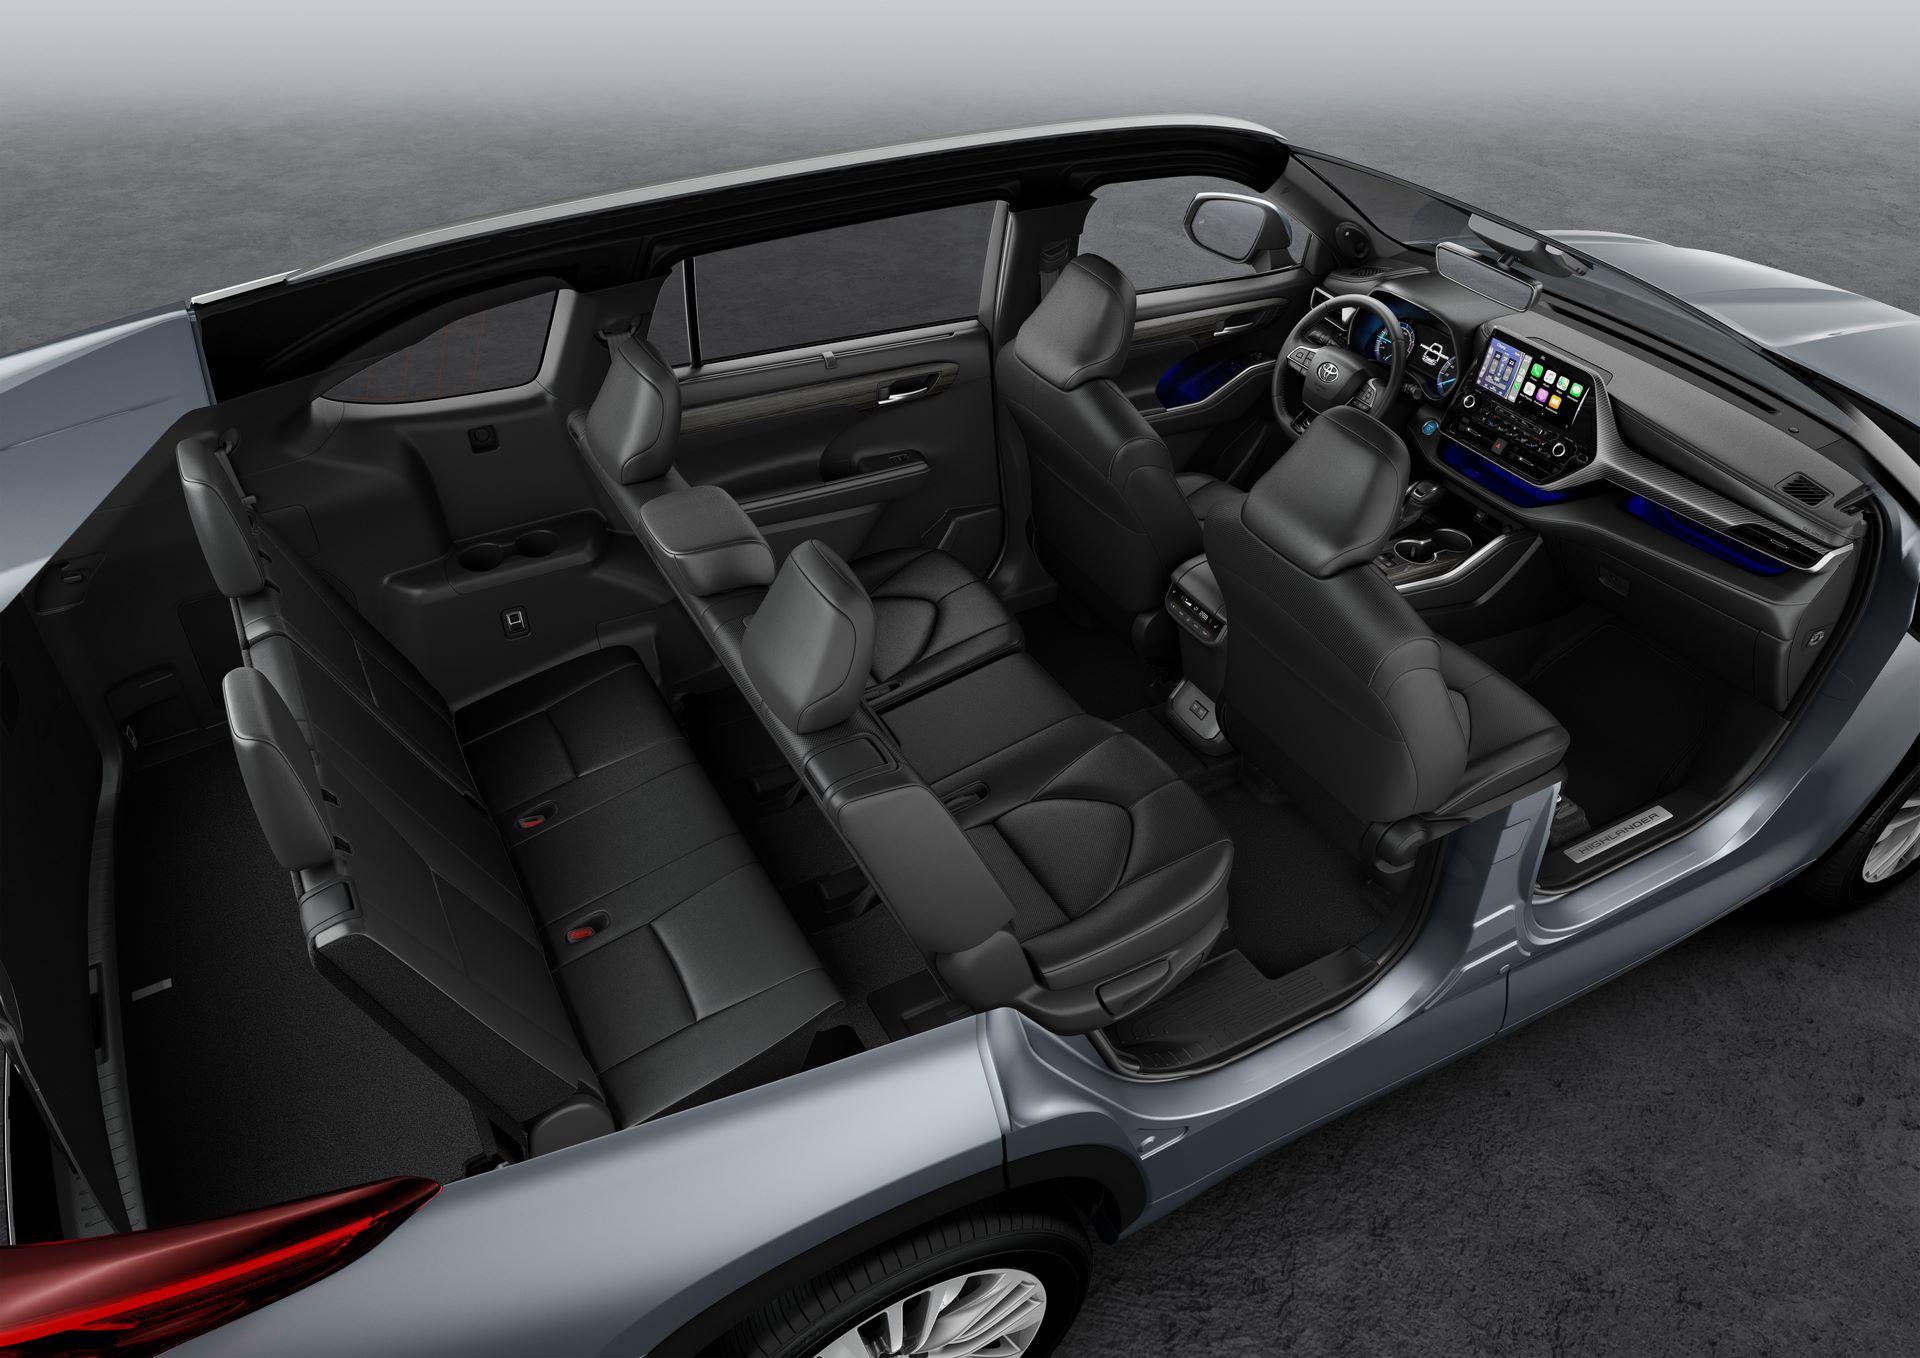 Toyota-Highlander-Europe-2021-6